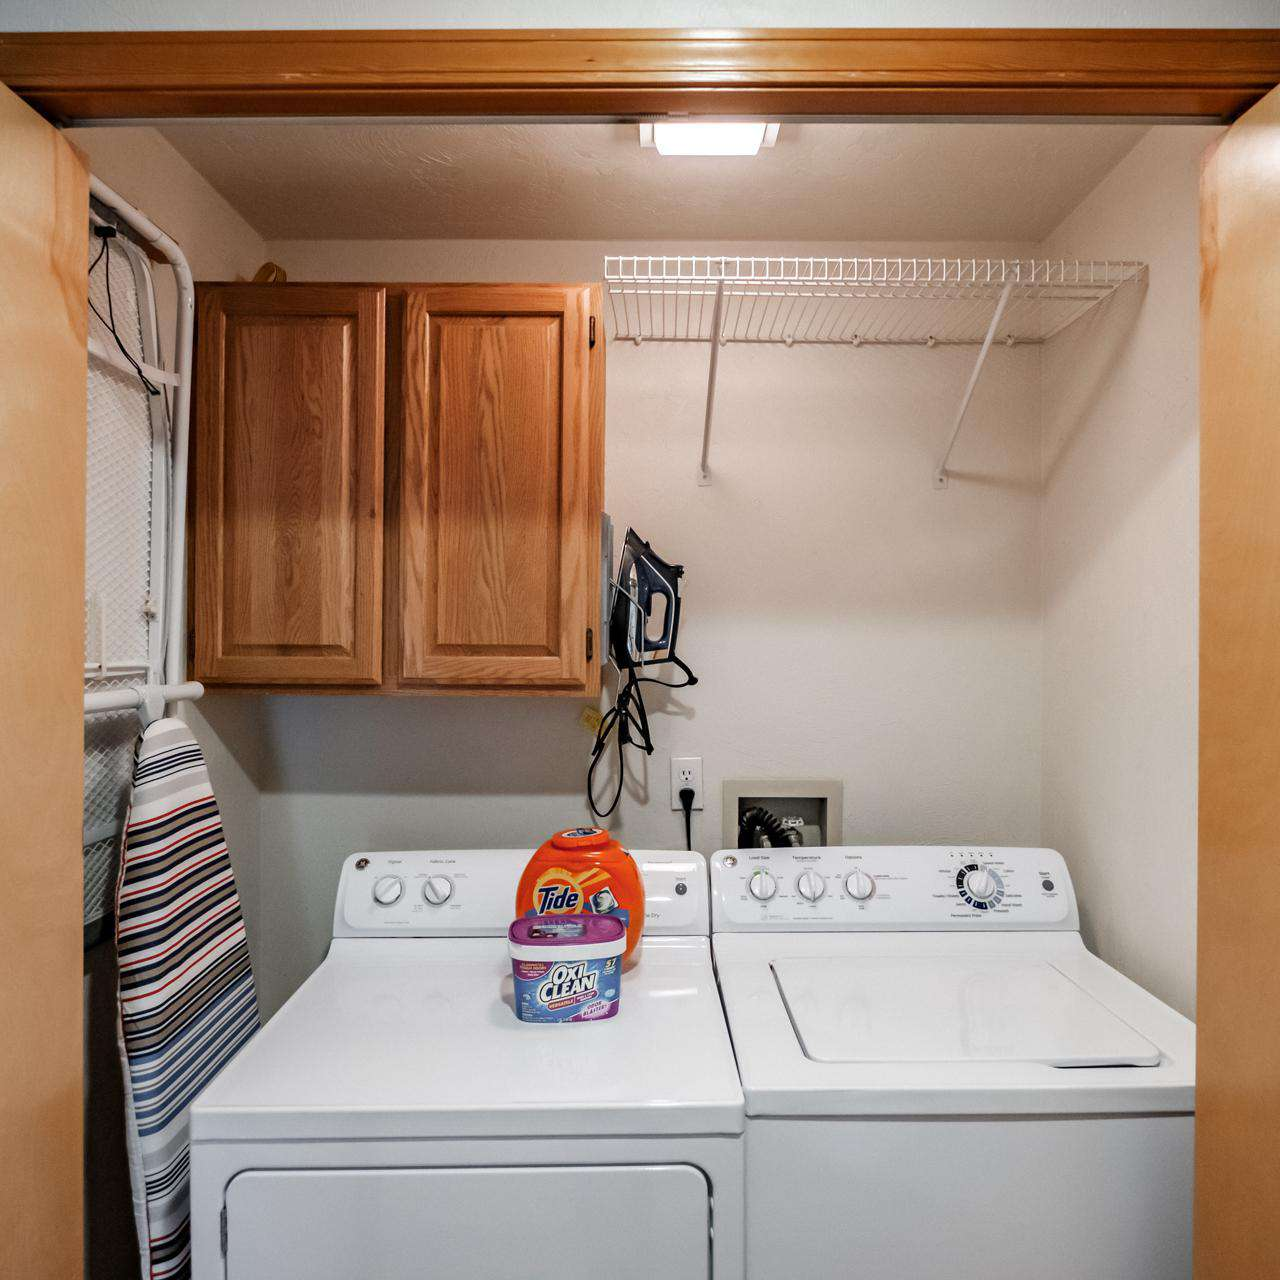 Utility Closet - Ironing board and iron.